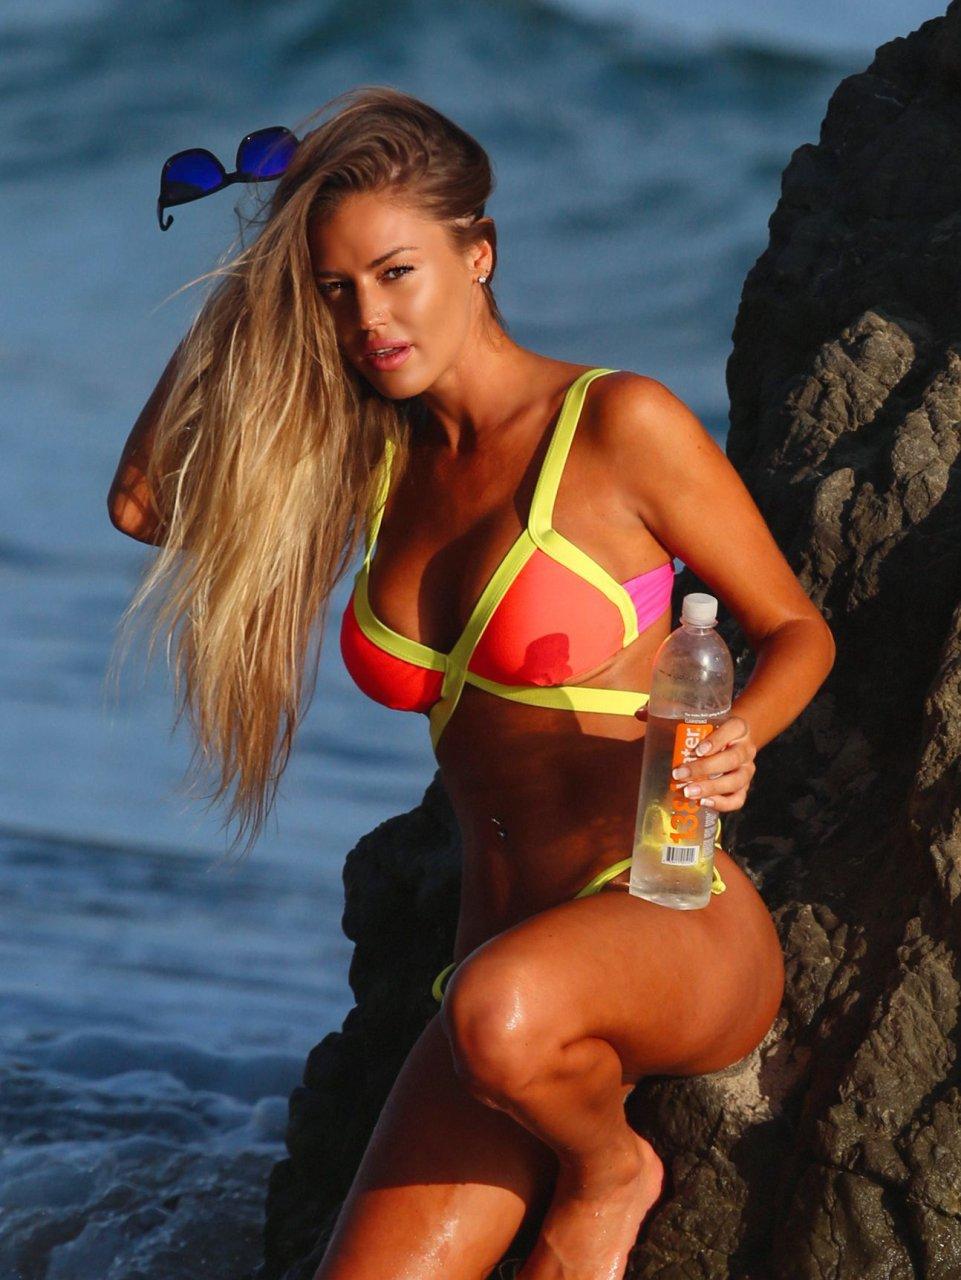 Hot sex videos free online